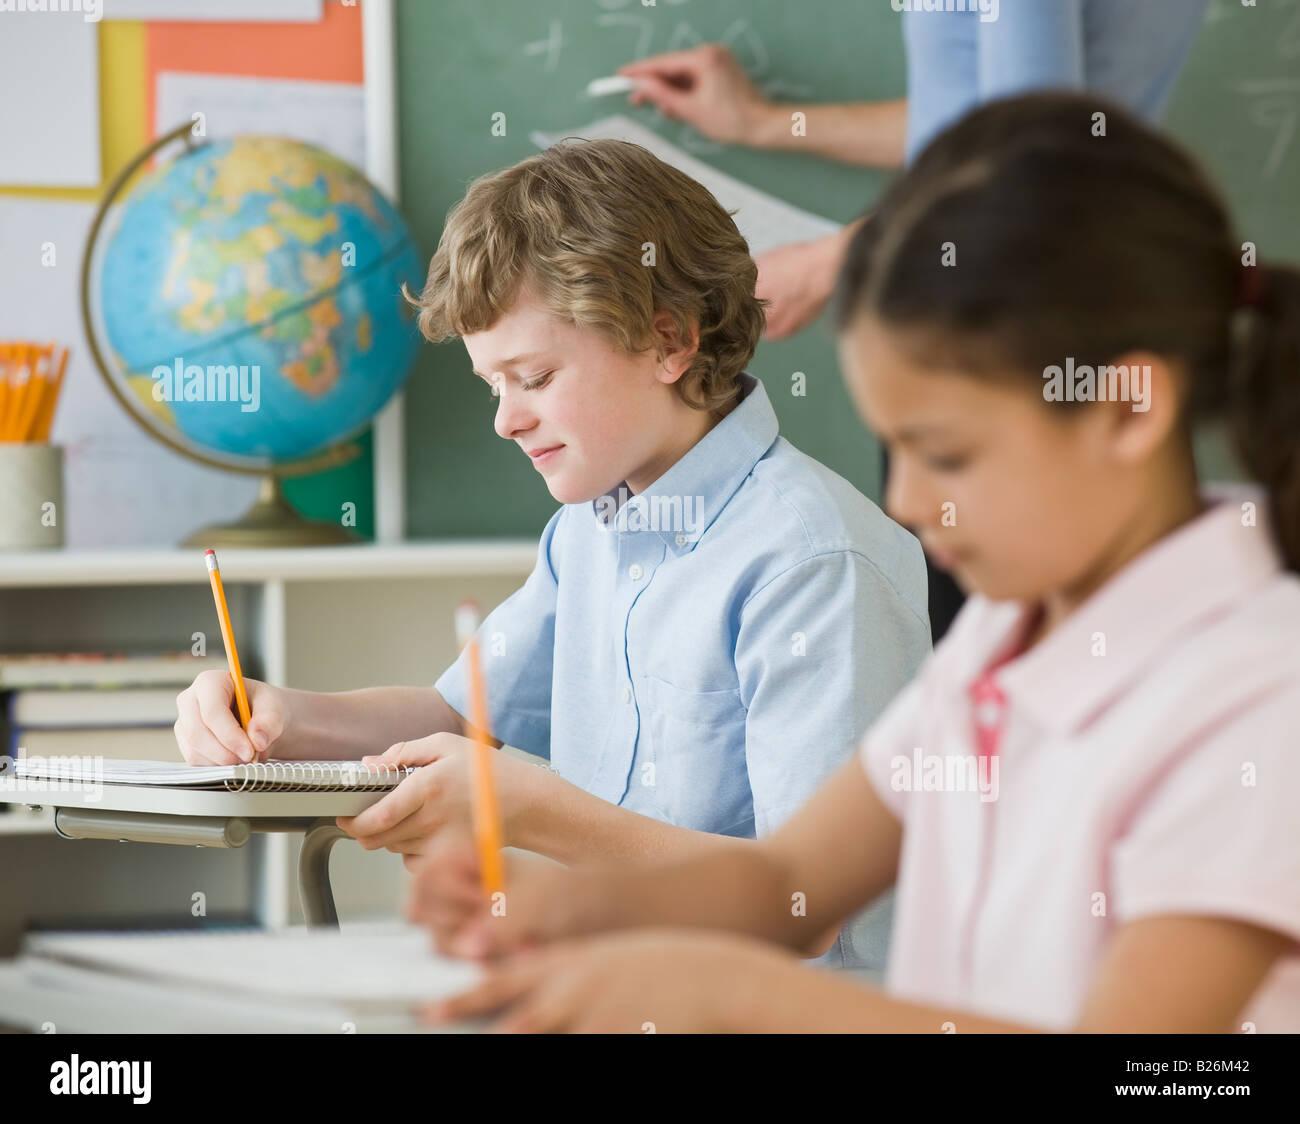 Multi-ethnic children writing at school desks - Stock Image